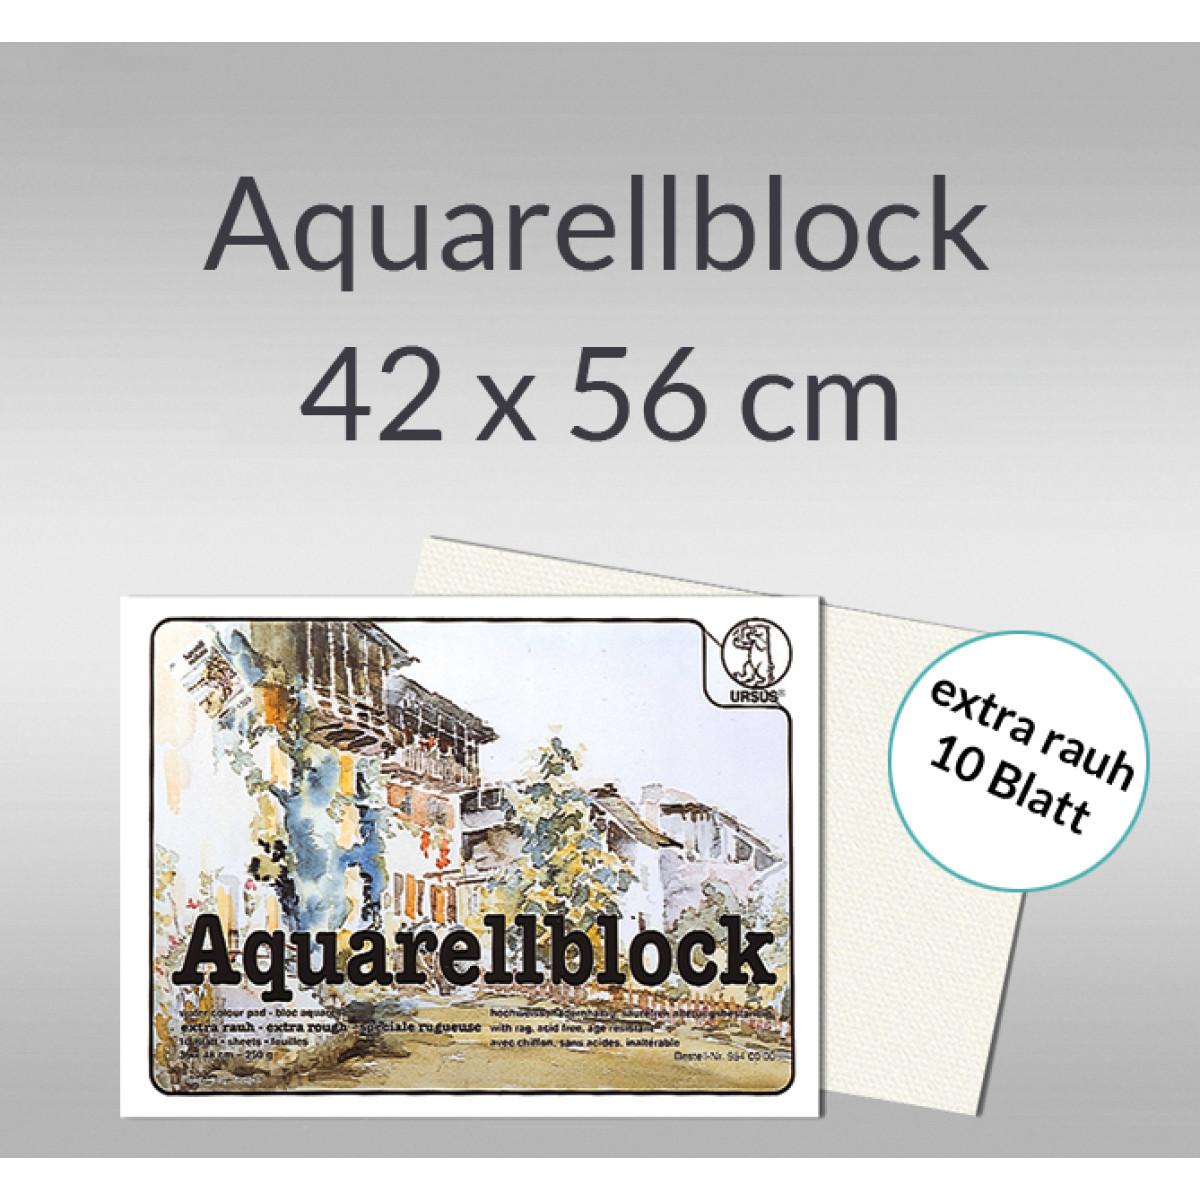 Aquarellblock extra rauh 250 g/qm 42 x 56 cm